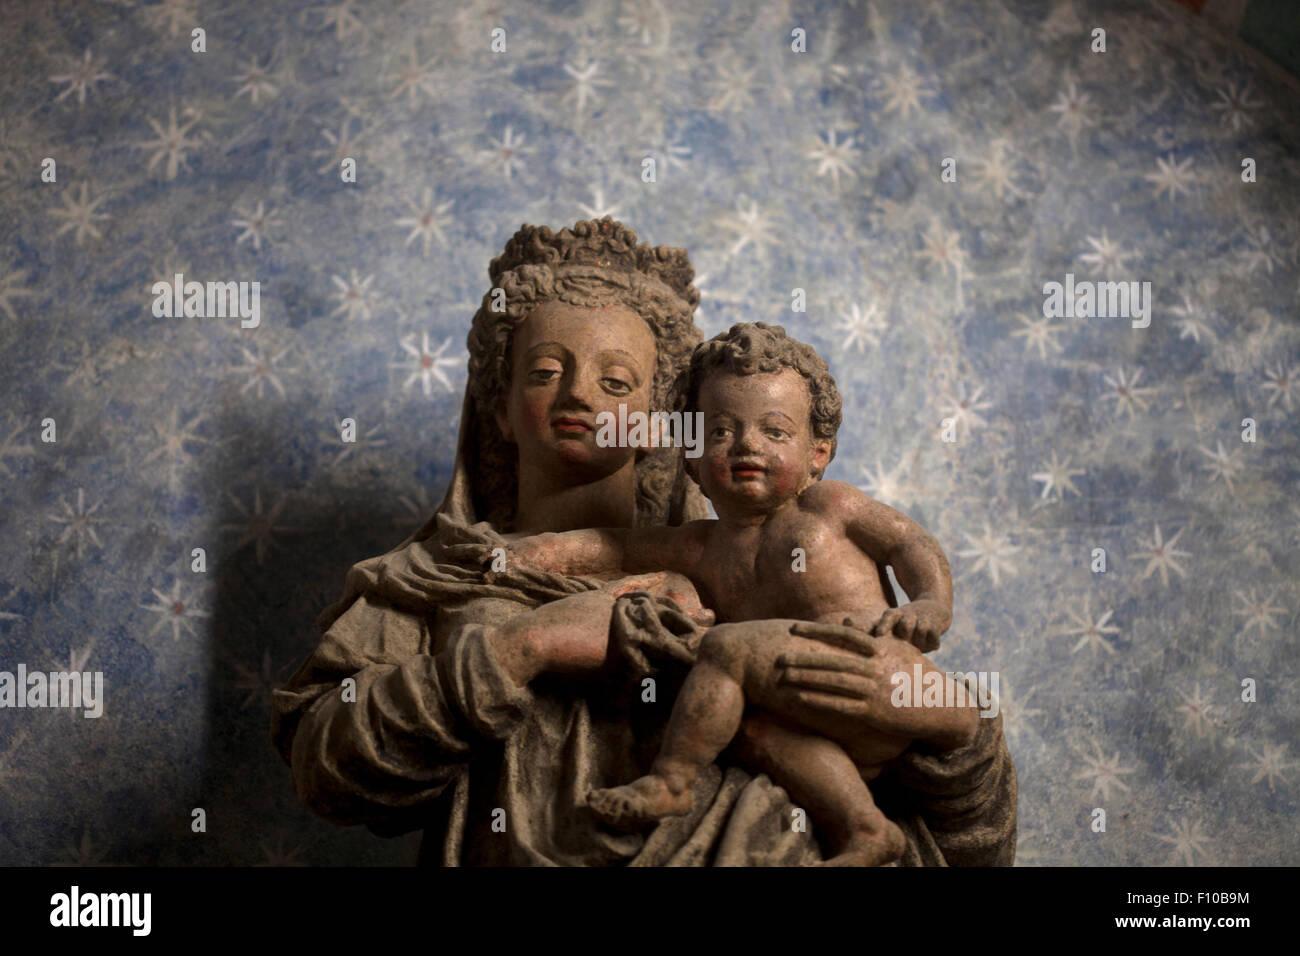 Statue Virgin Mary Baby Jesus Stock Photos Amp Statue Virgin